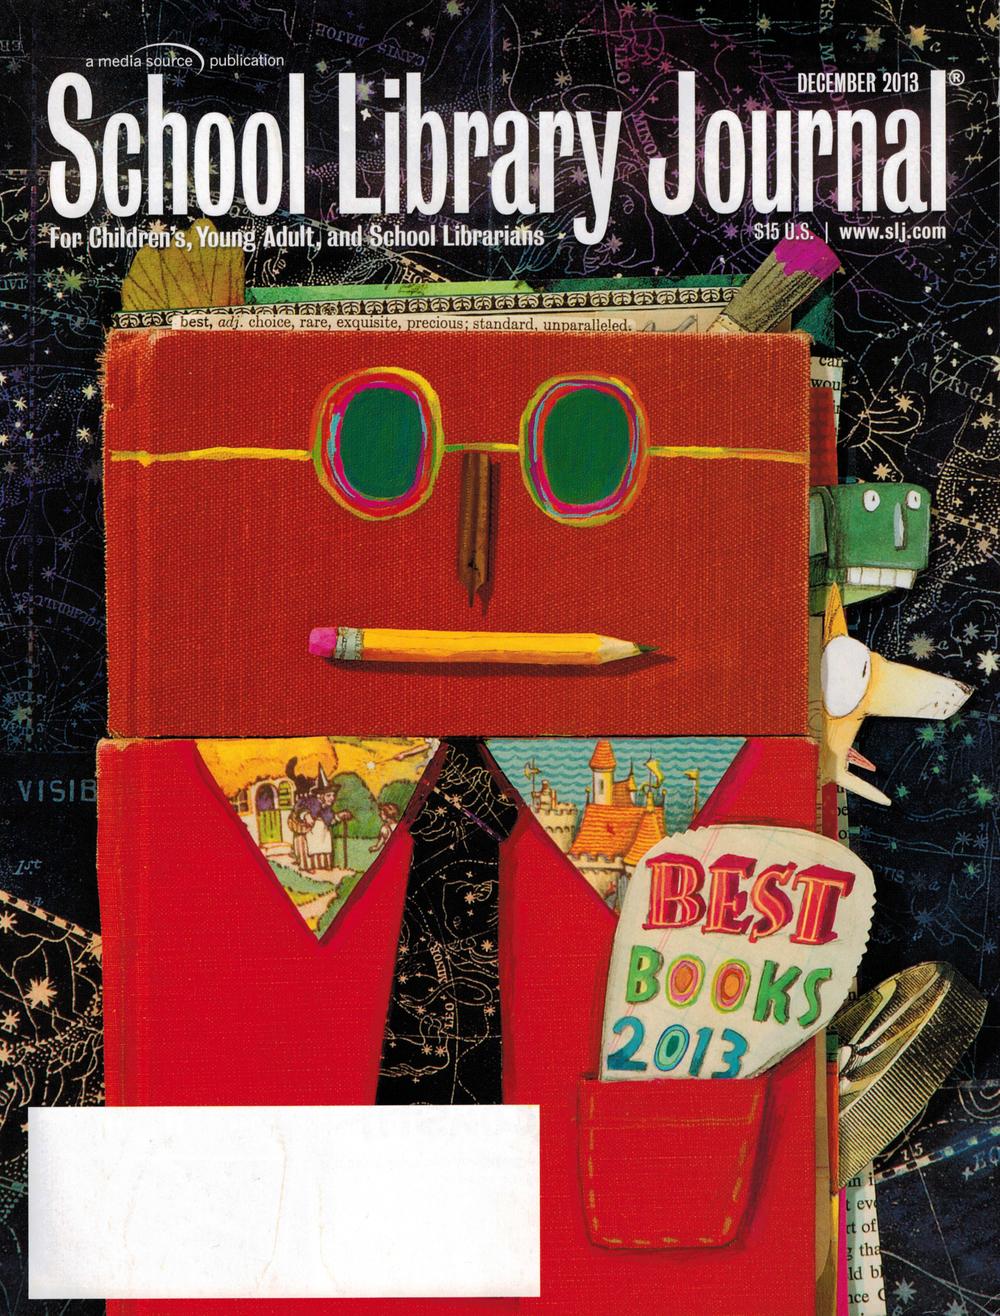 School Library Journal cover.JPG